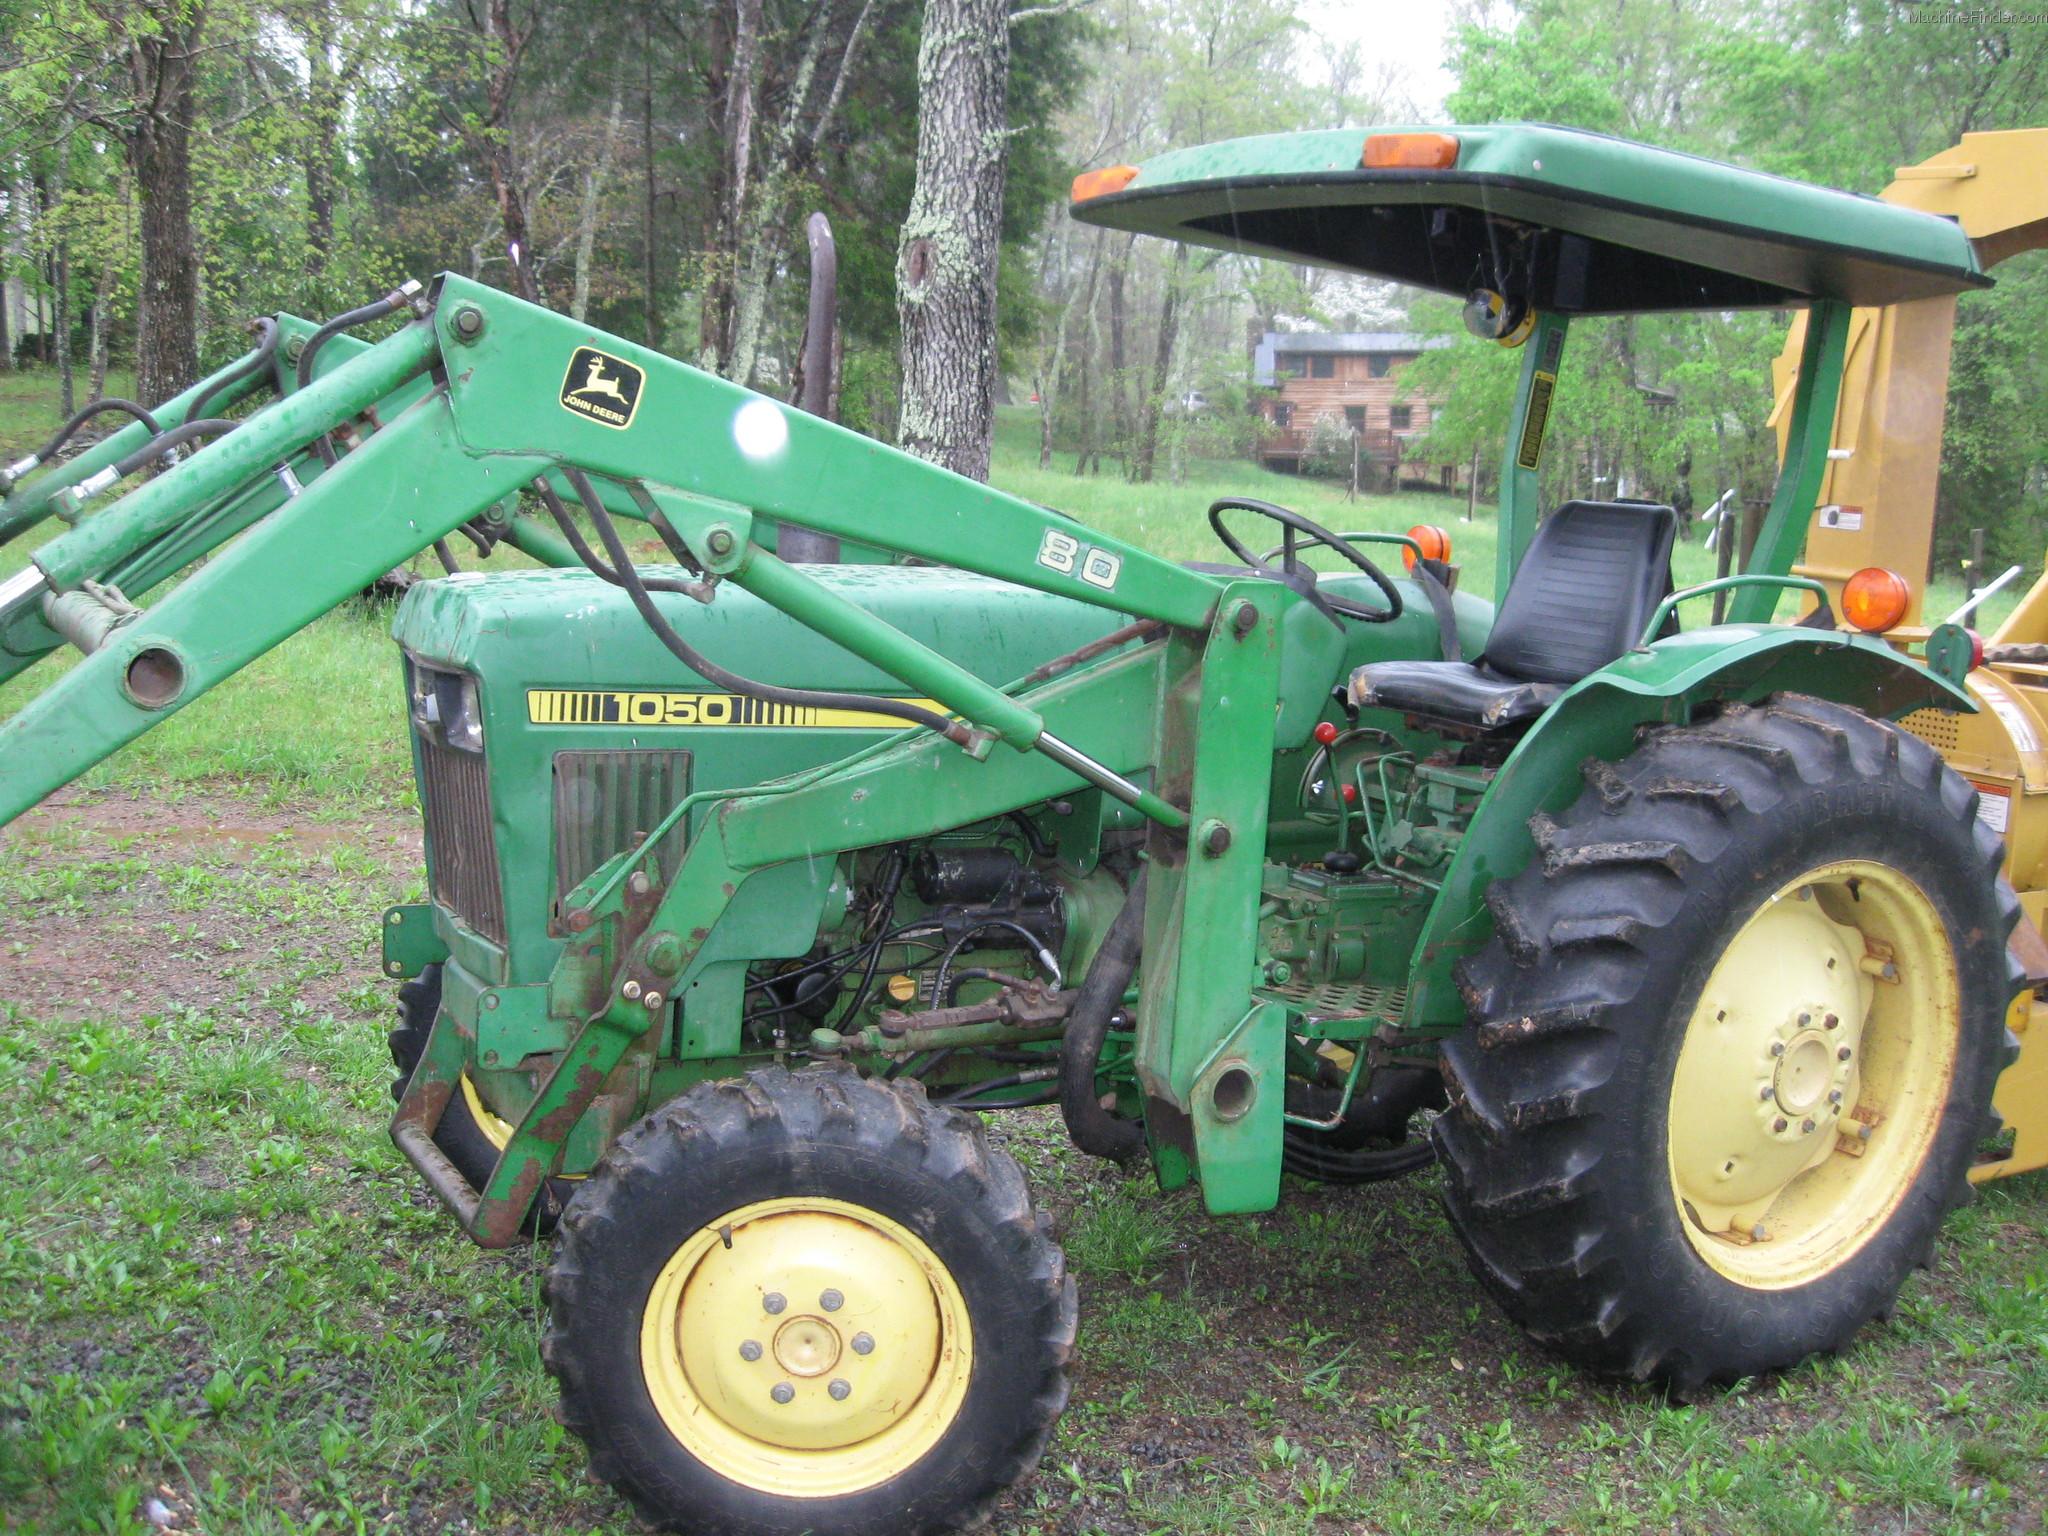 1988 John Deere 1050 Tractors - Compact (1-40hp.) - John ...